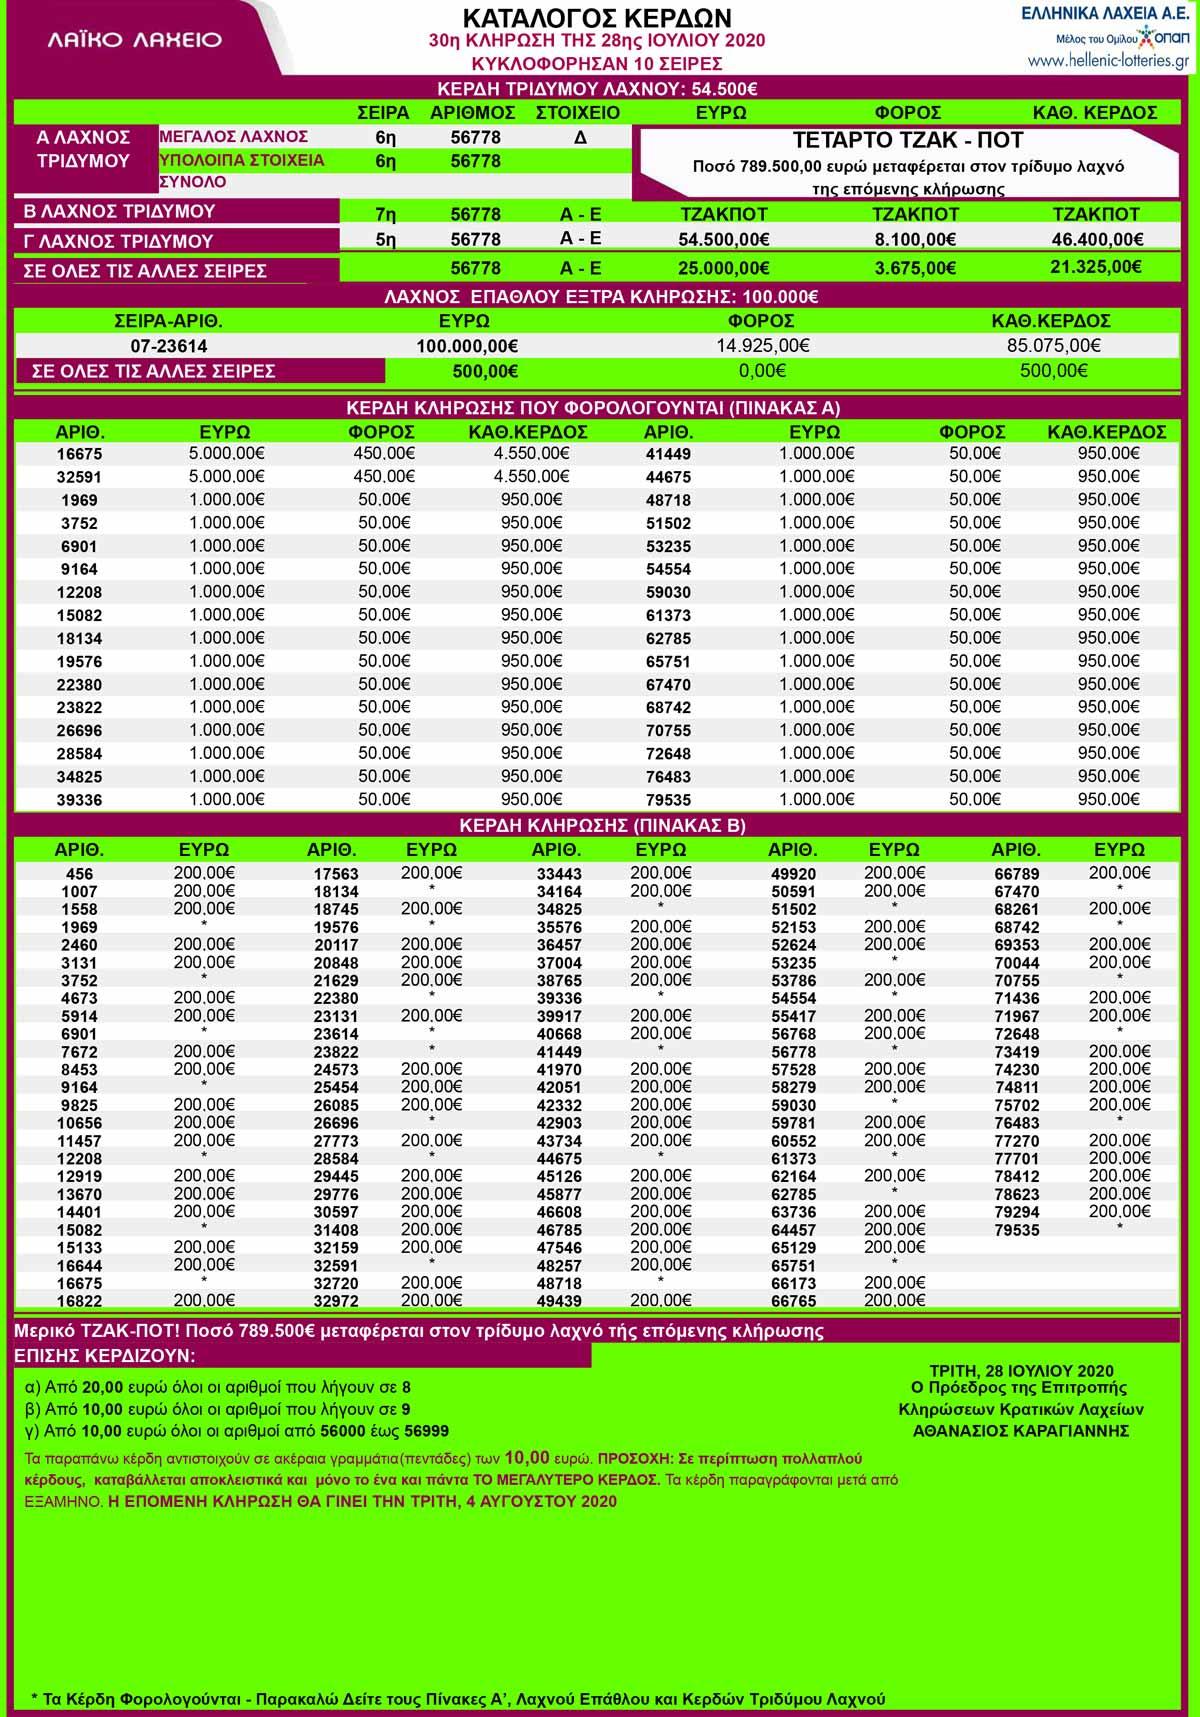 laiko-laxeio-28-07-2020-λαικο-λαχειο-αποτελεσματα-κληρωσης-28-ιουλιου-2020